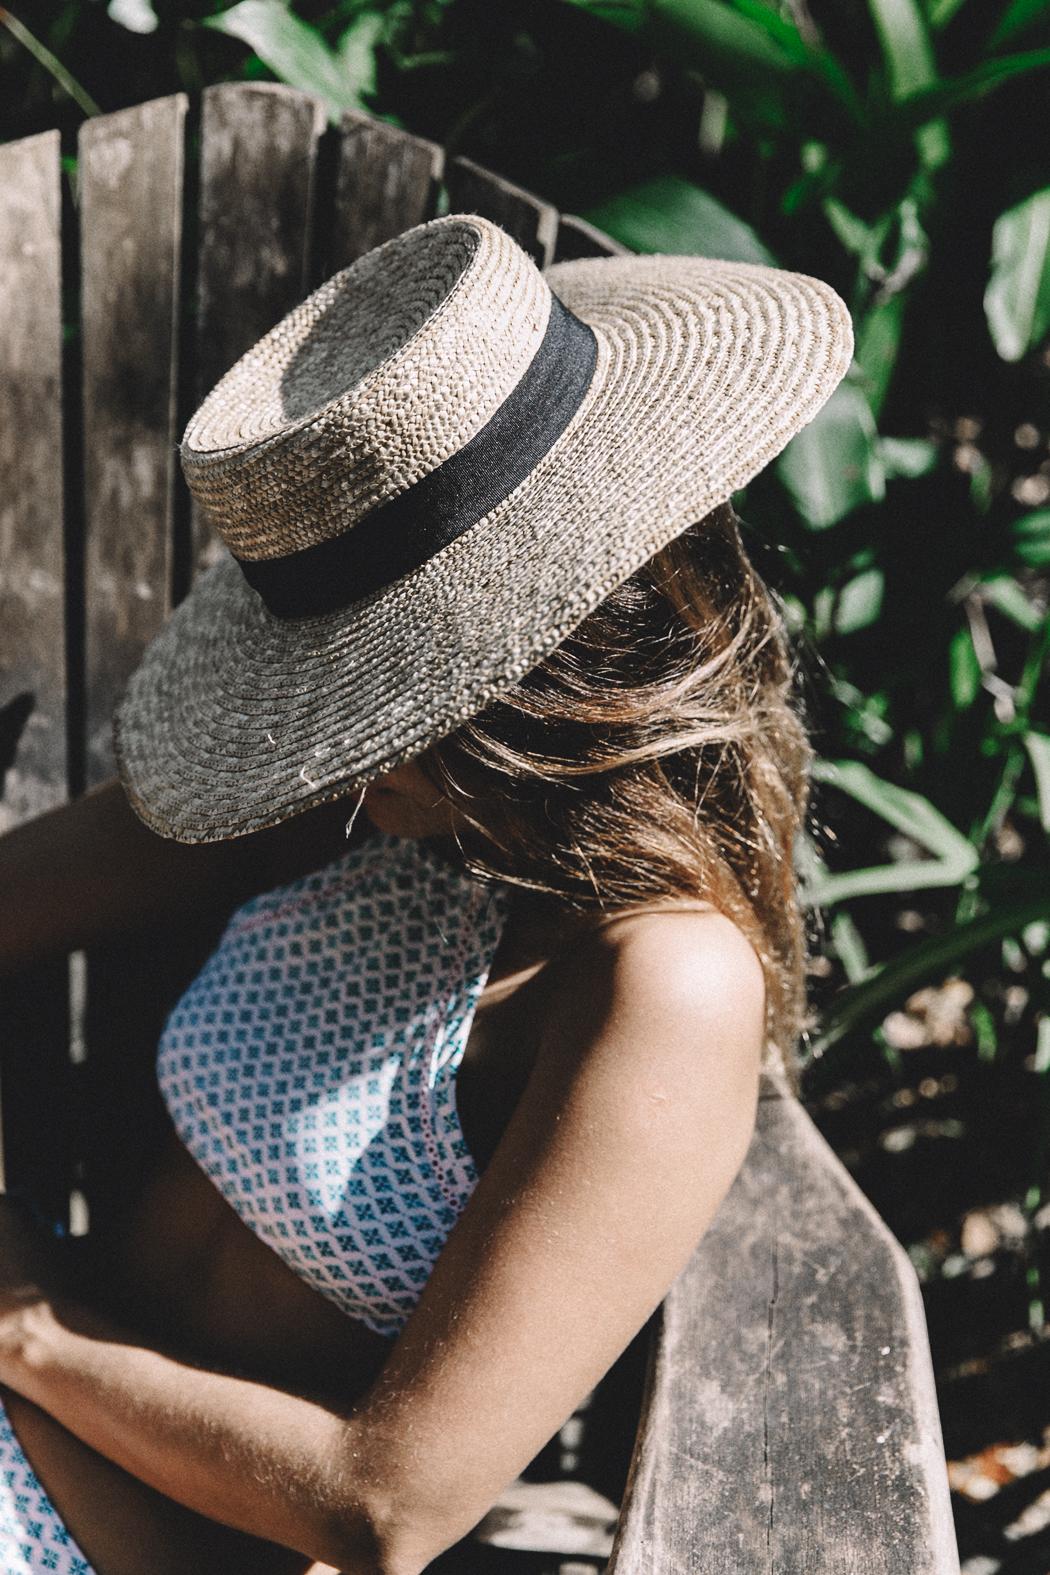 YS_FALLS-Jamaica-Peony_Swimwear-Lack_Of_Colors_Hat-Straw_Hat-Swimwear_Bikini-Outfit-37